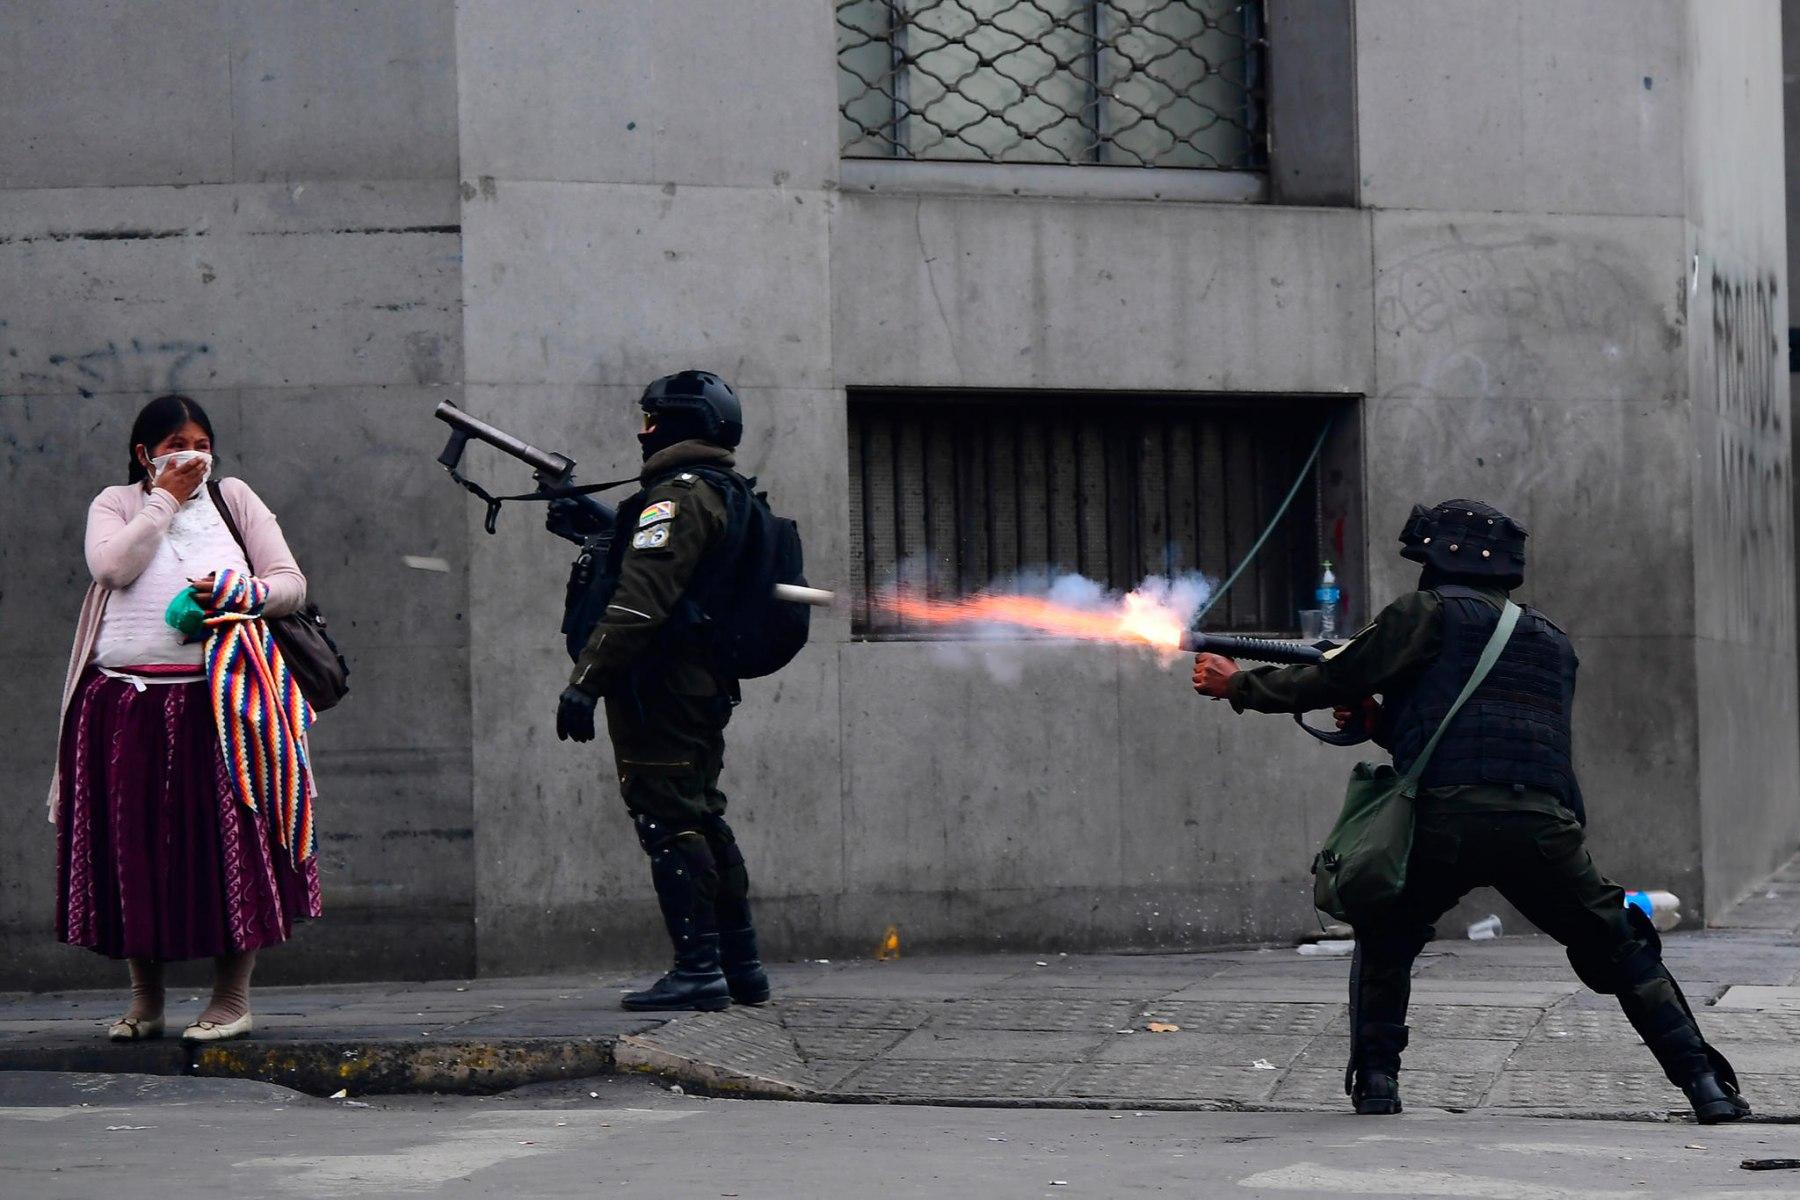 https://i0.wp.com/artinews.gr/assets/images/diethni/bolibiafon.jpg